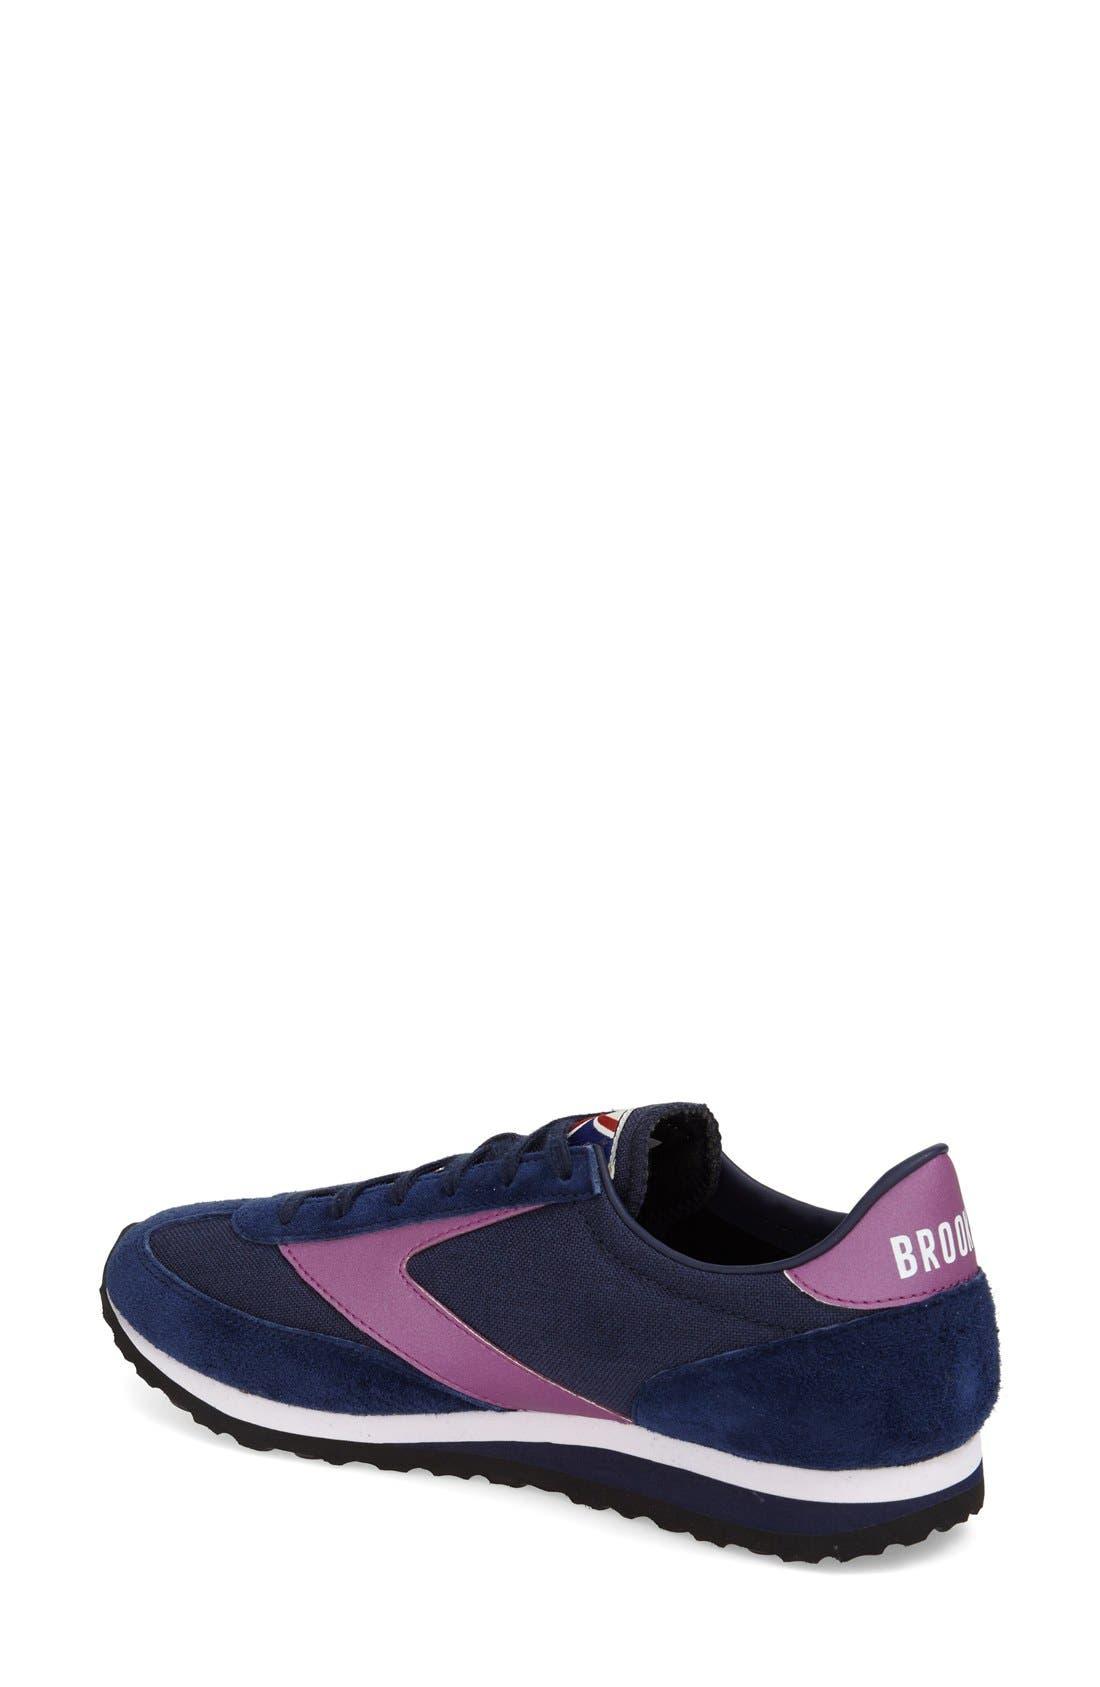 'Vanguard' Sneaker,                             Alternate thumbnail 81, color,